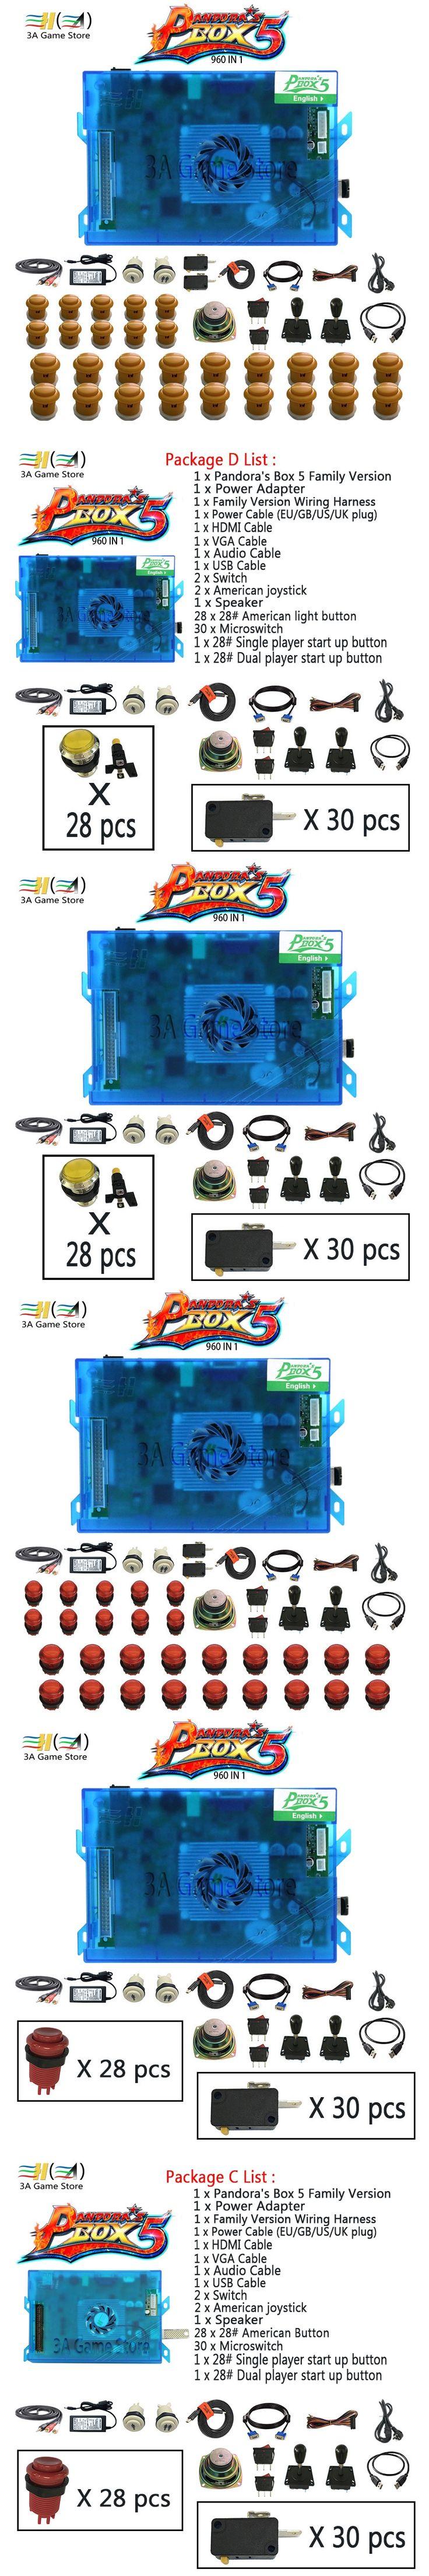 Pandora box 4 Pandora's Box 4S 680 in 1 Joysticks Arcade Stick button Accessories set joystick diy arcade controls machine parts